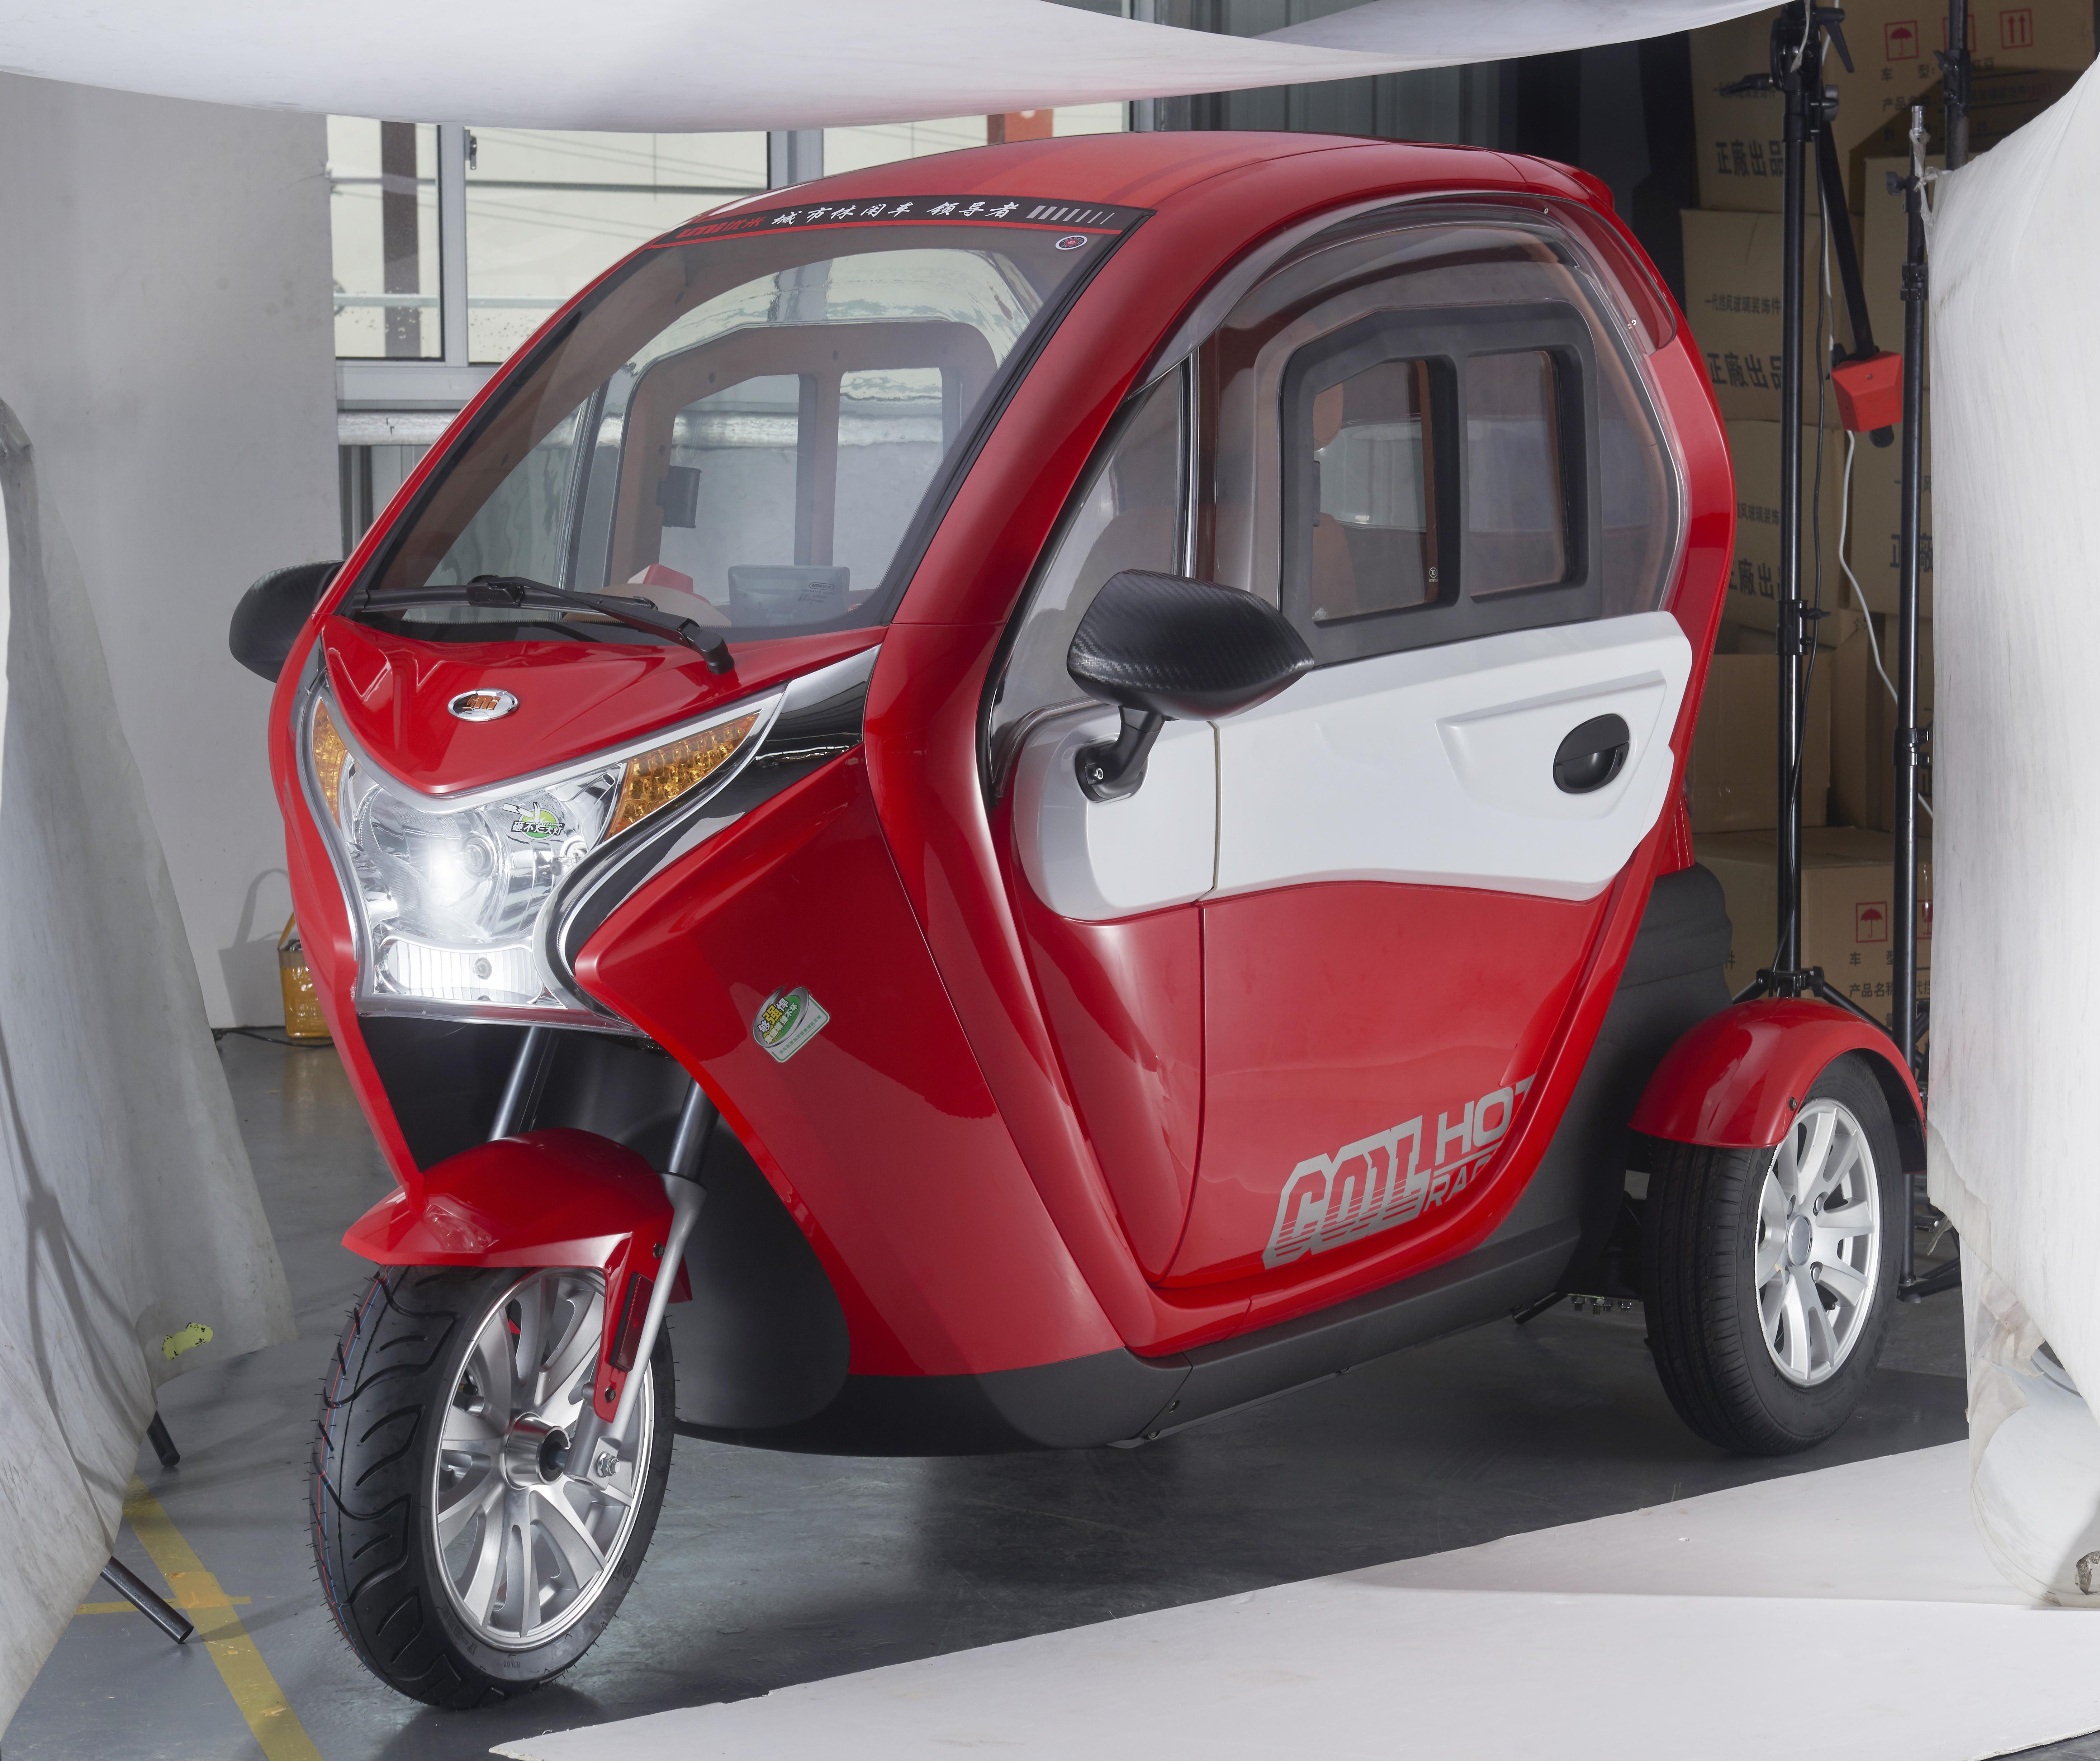 New COOL Electric Tricycle | Cebu Solar Inc